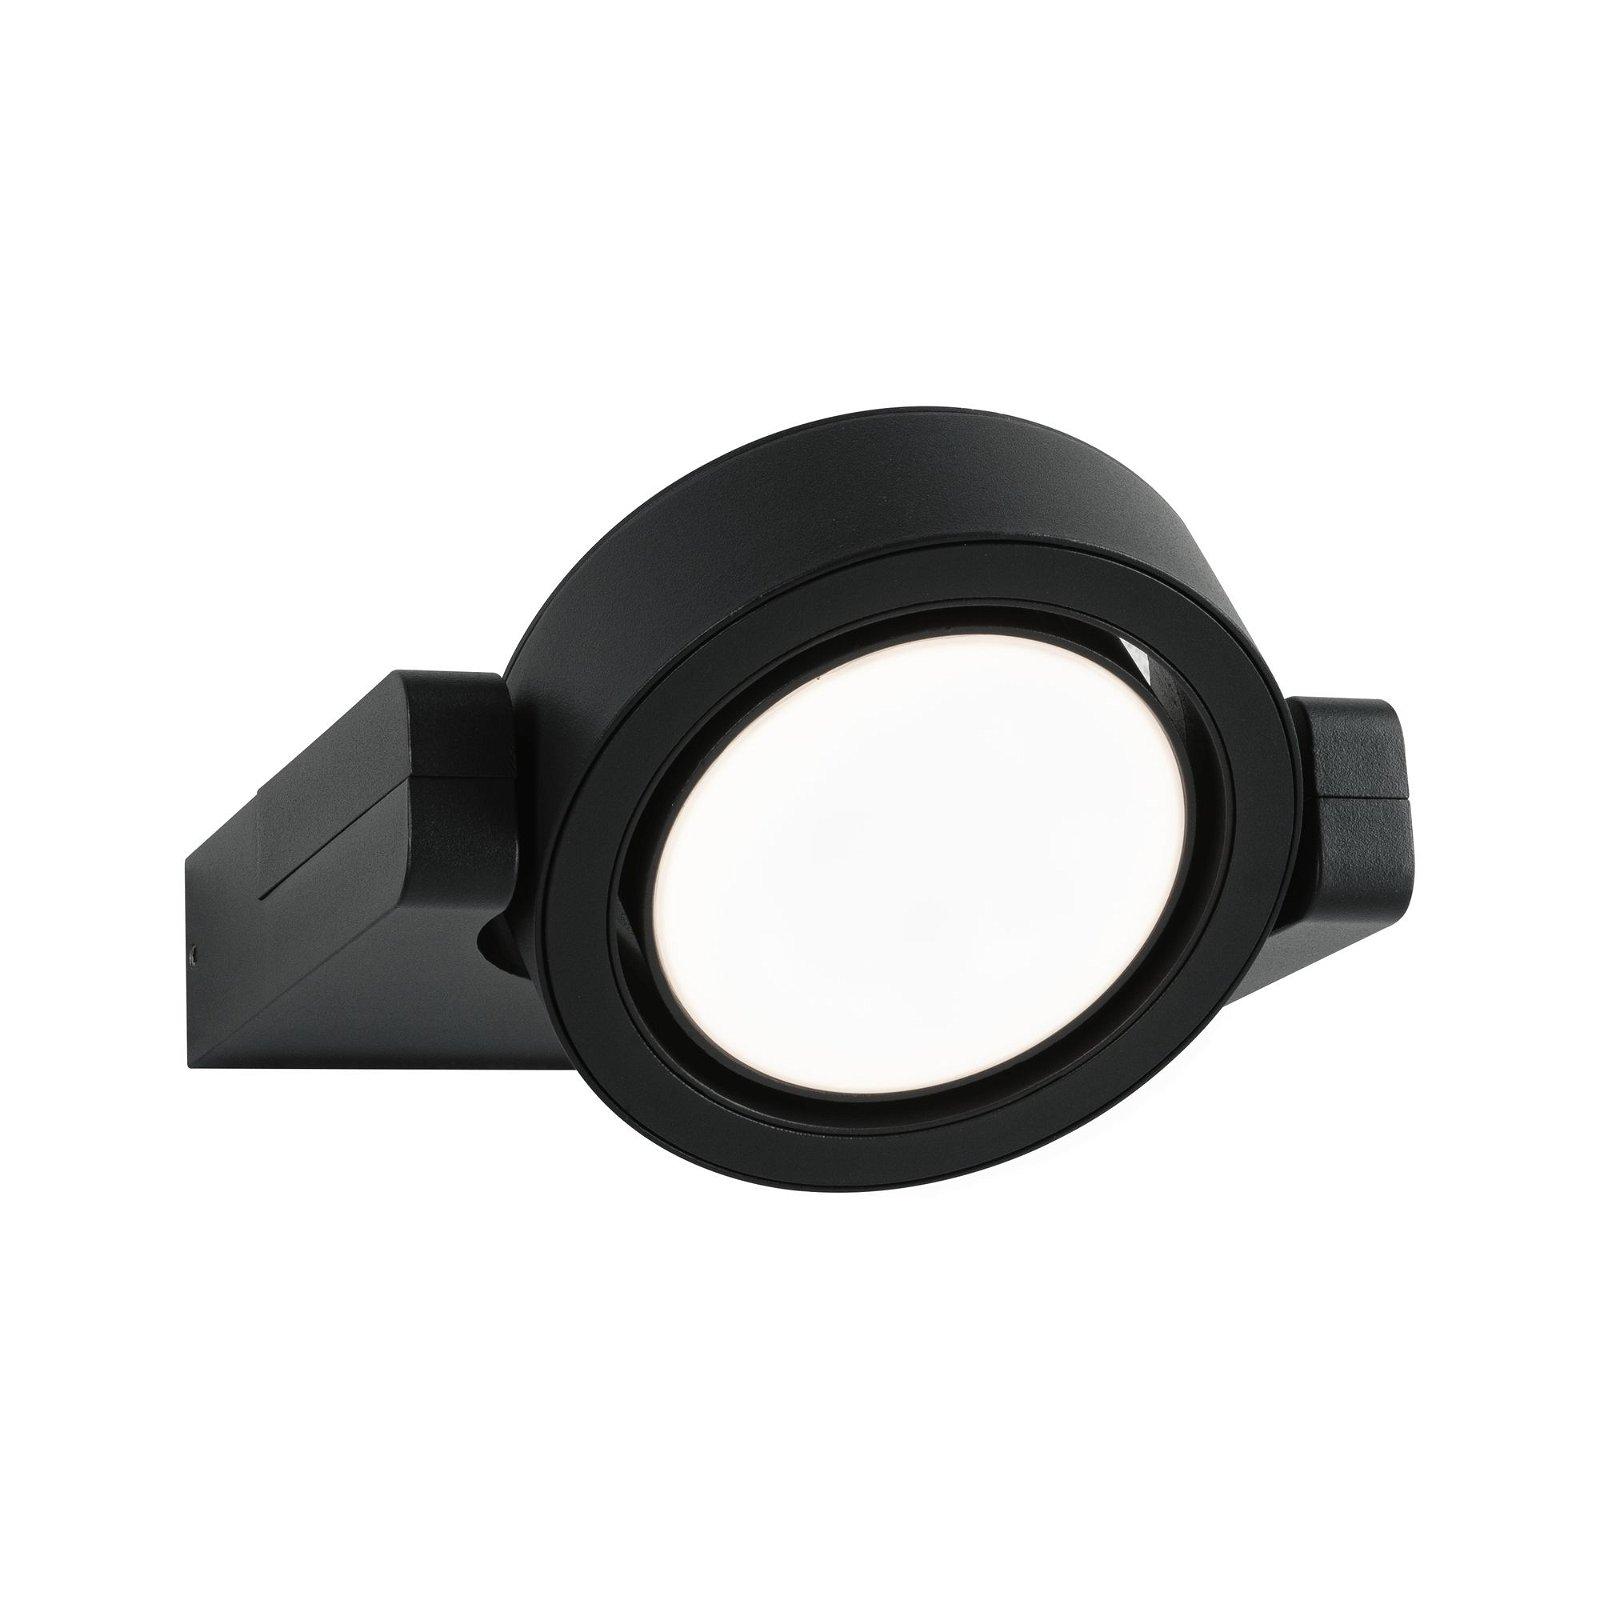 LED Außenwandleuchte Swivea IP44 183x206mm 3000K 8W 1150lm 230V Anthrazit Aluminium